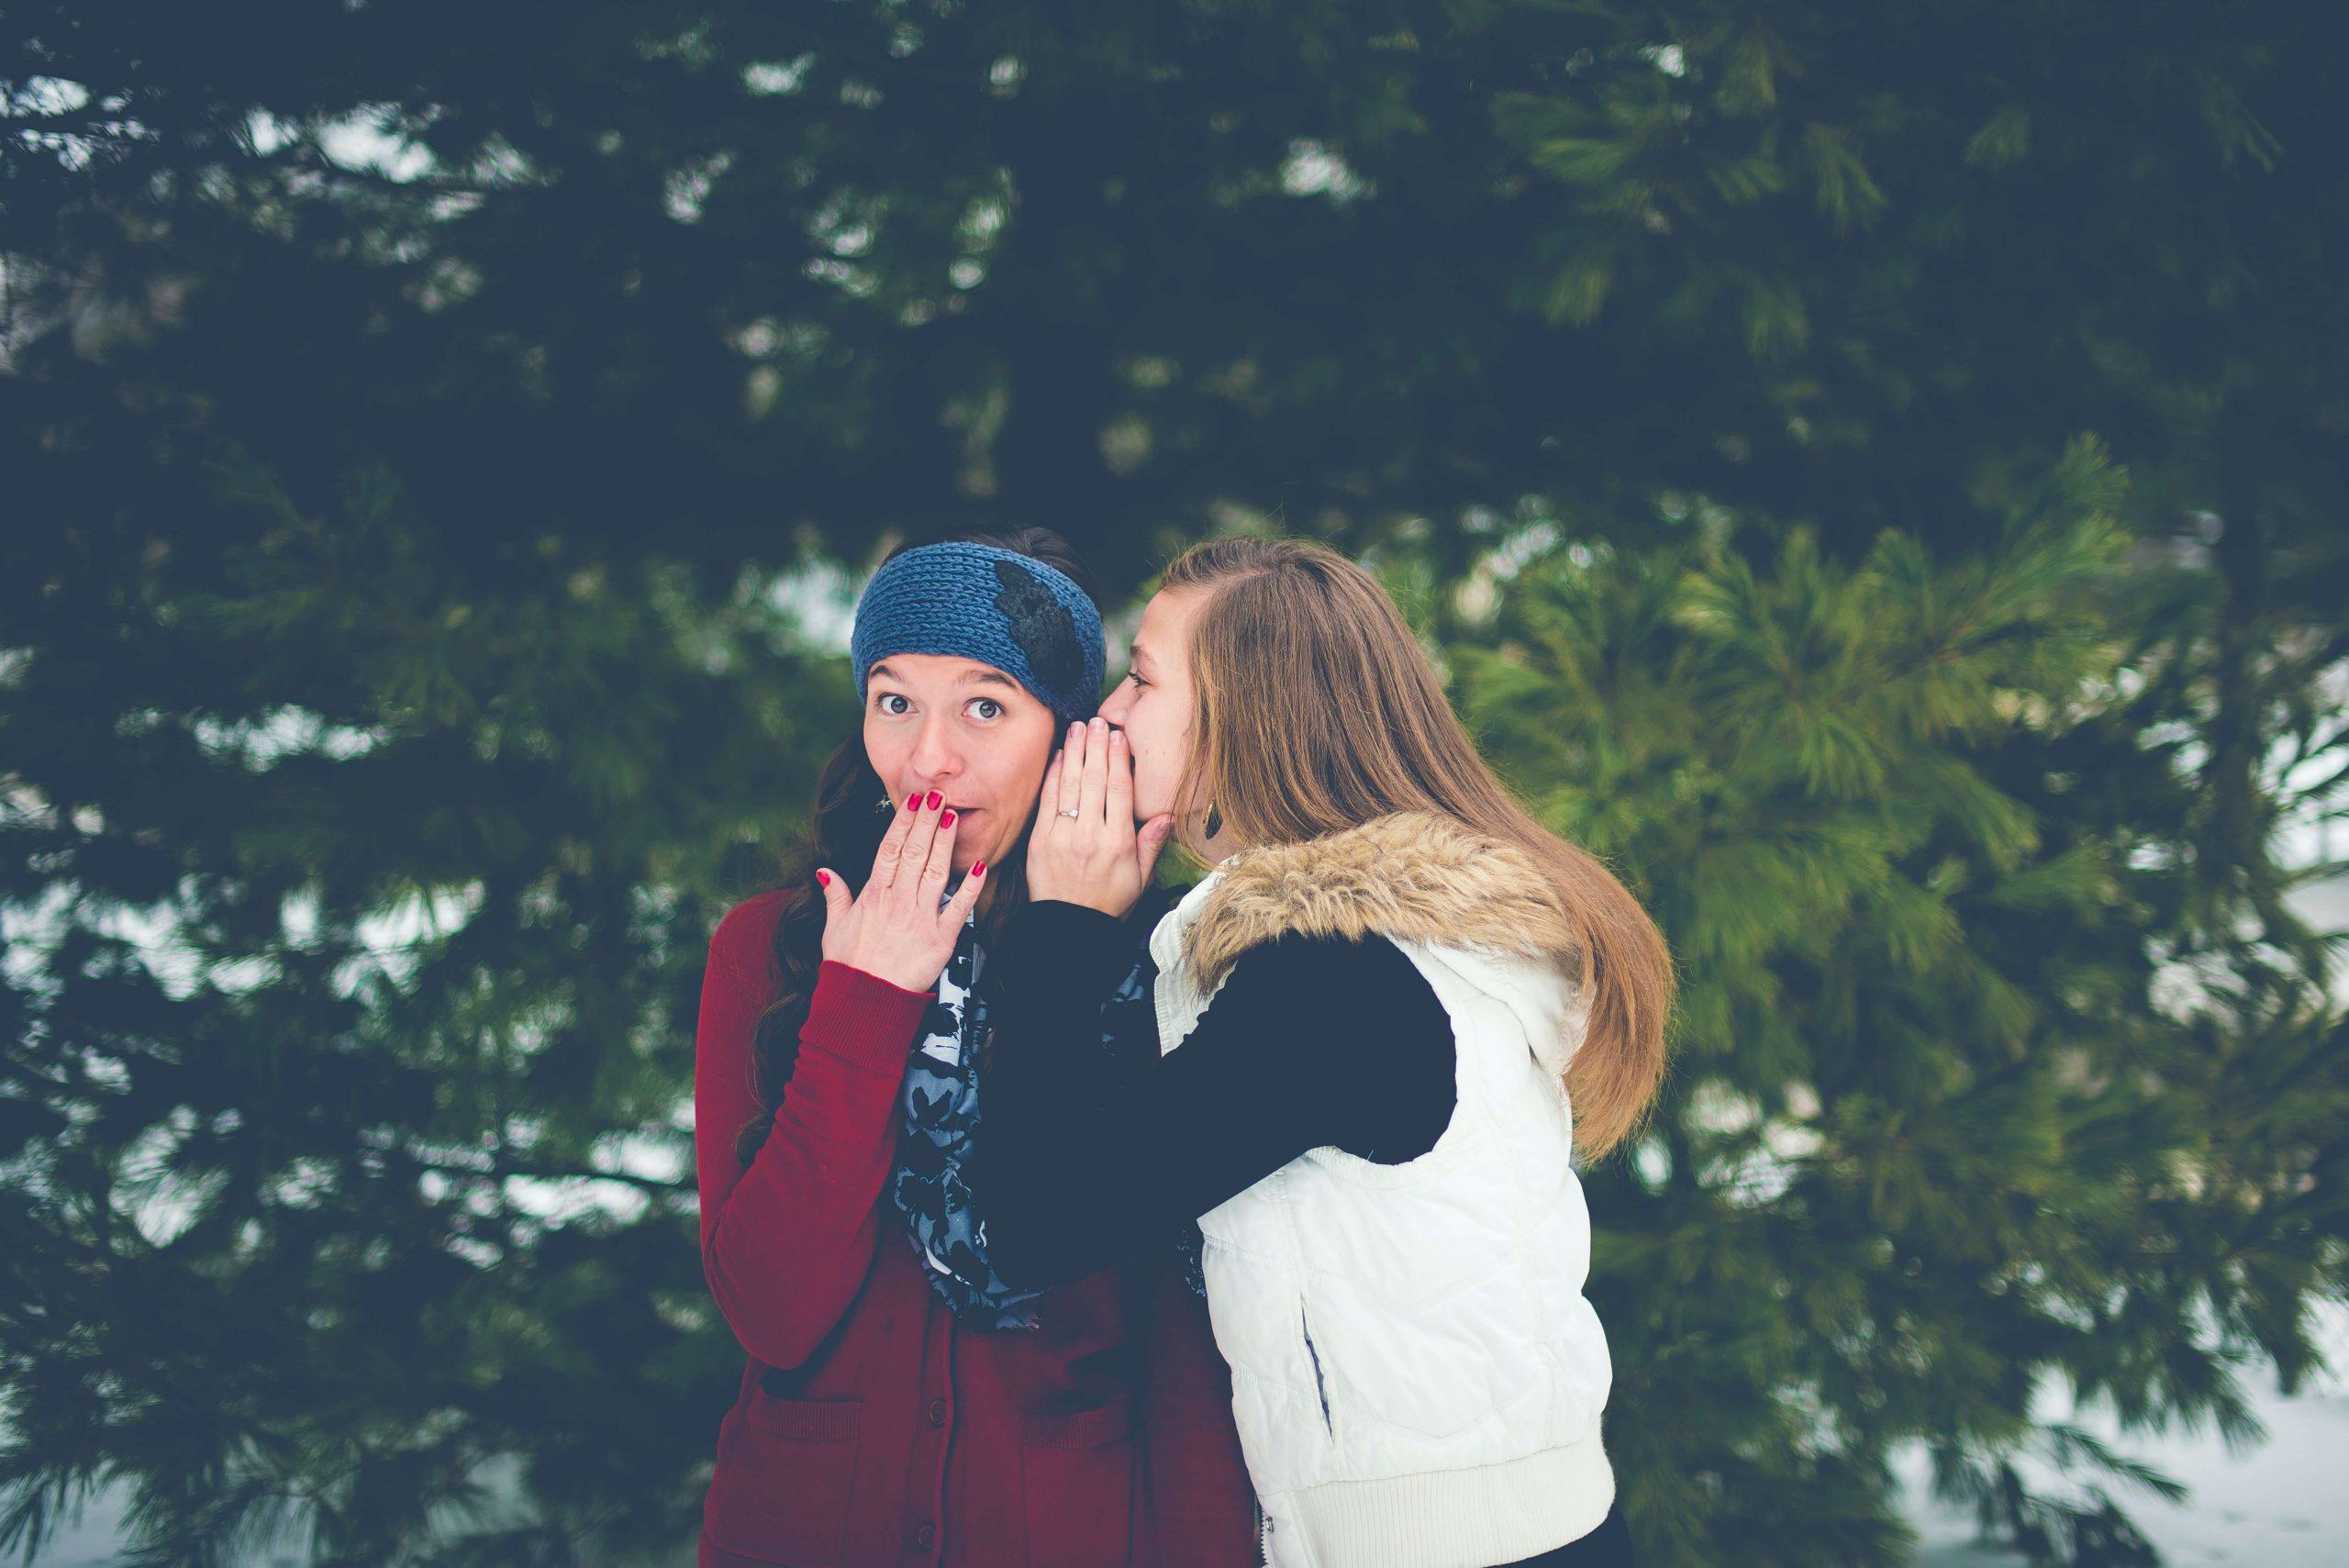 Two girls telling a shocking secret|www.parentinghighschoolers.com